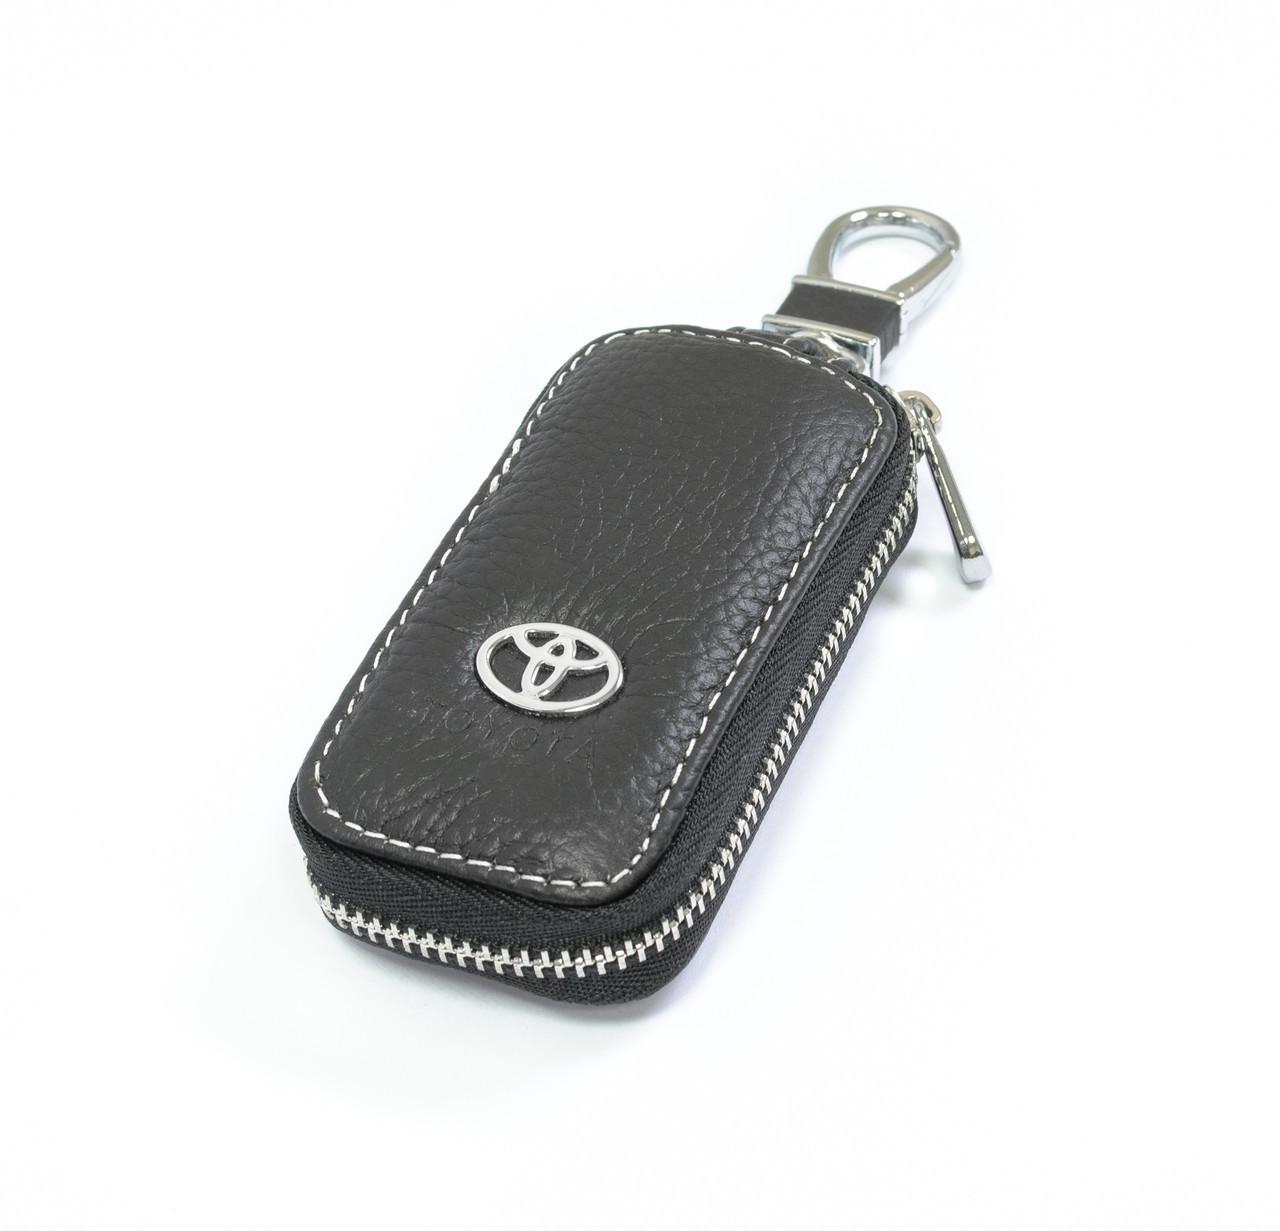 Ключница Carss с логотипом TOYOTA 07010 черная